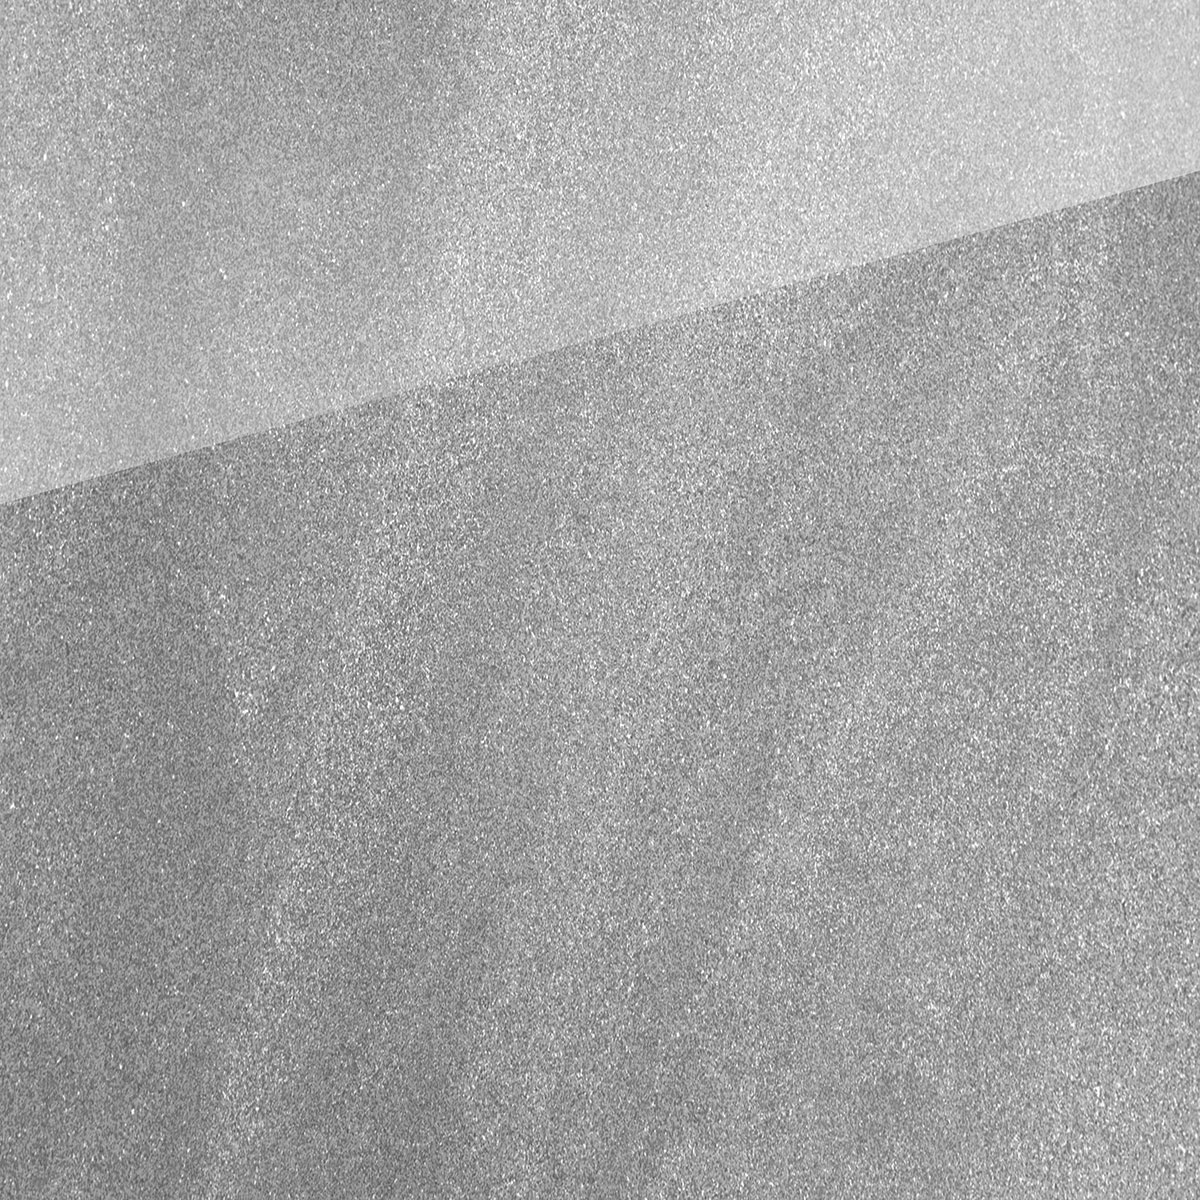 CHROMA grau Image